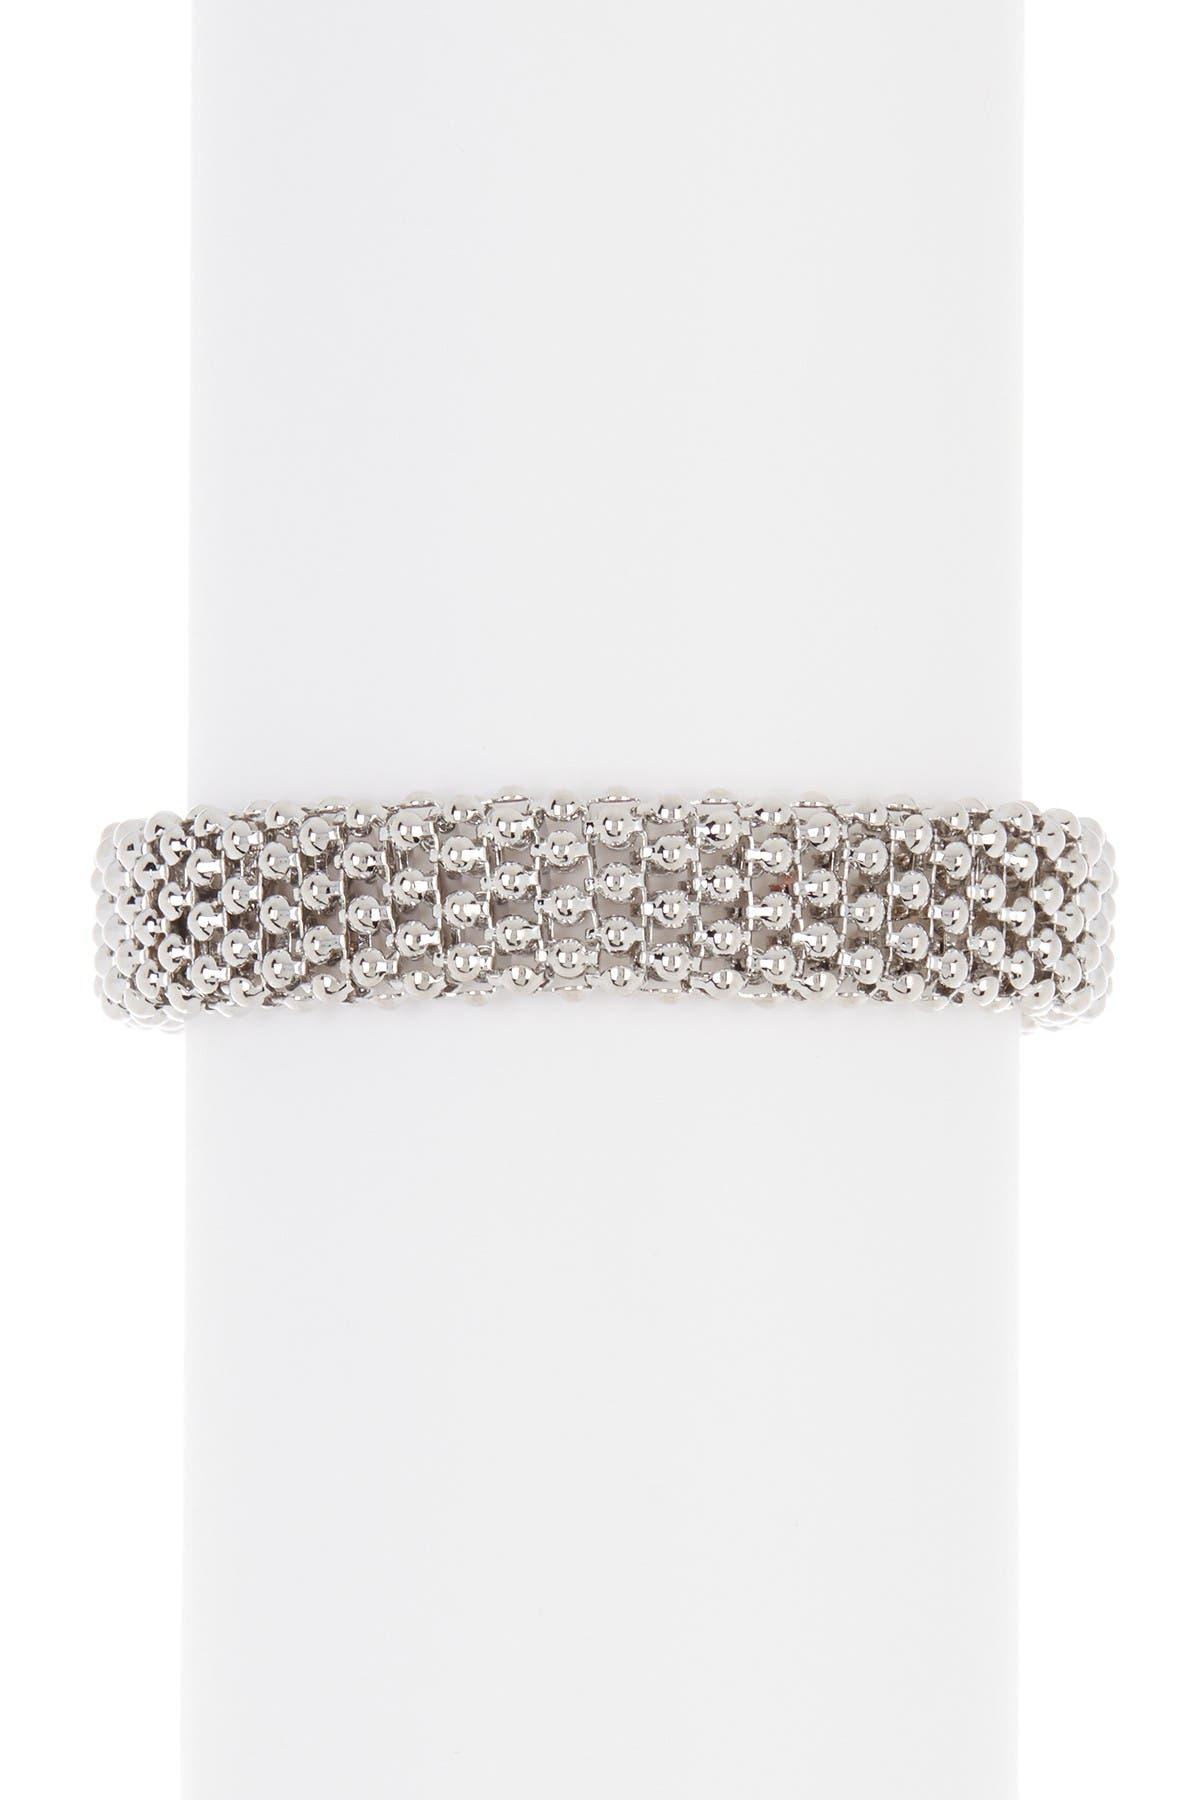 Image of Meshmerise Popcorn Mesh CZ Flexible Buckle Bracelet